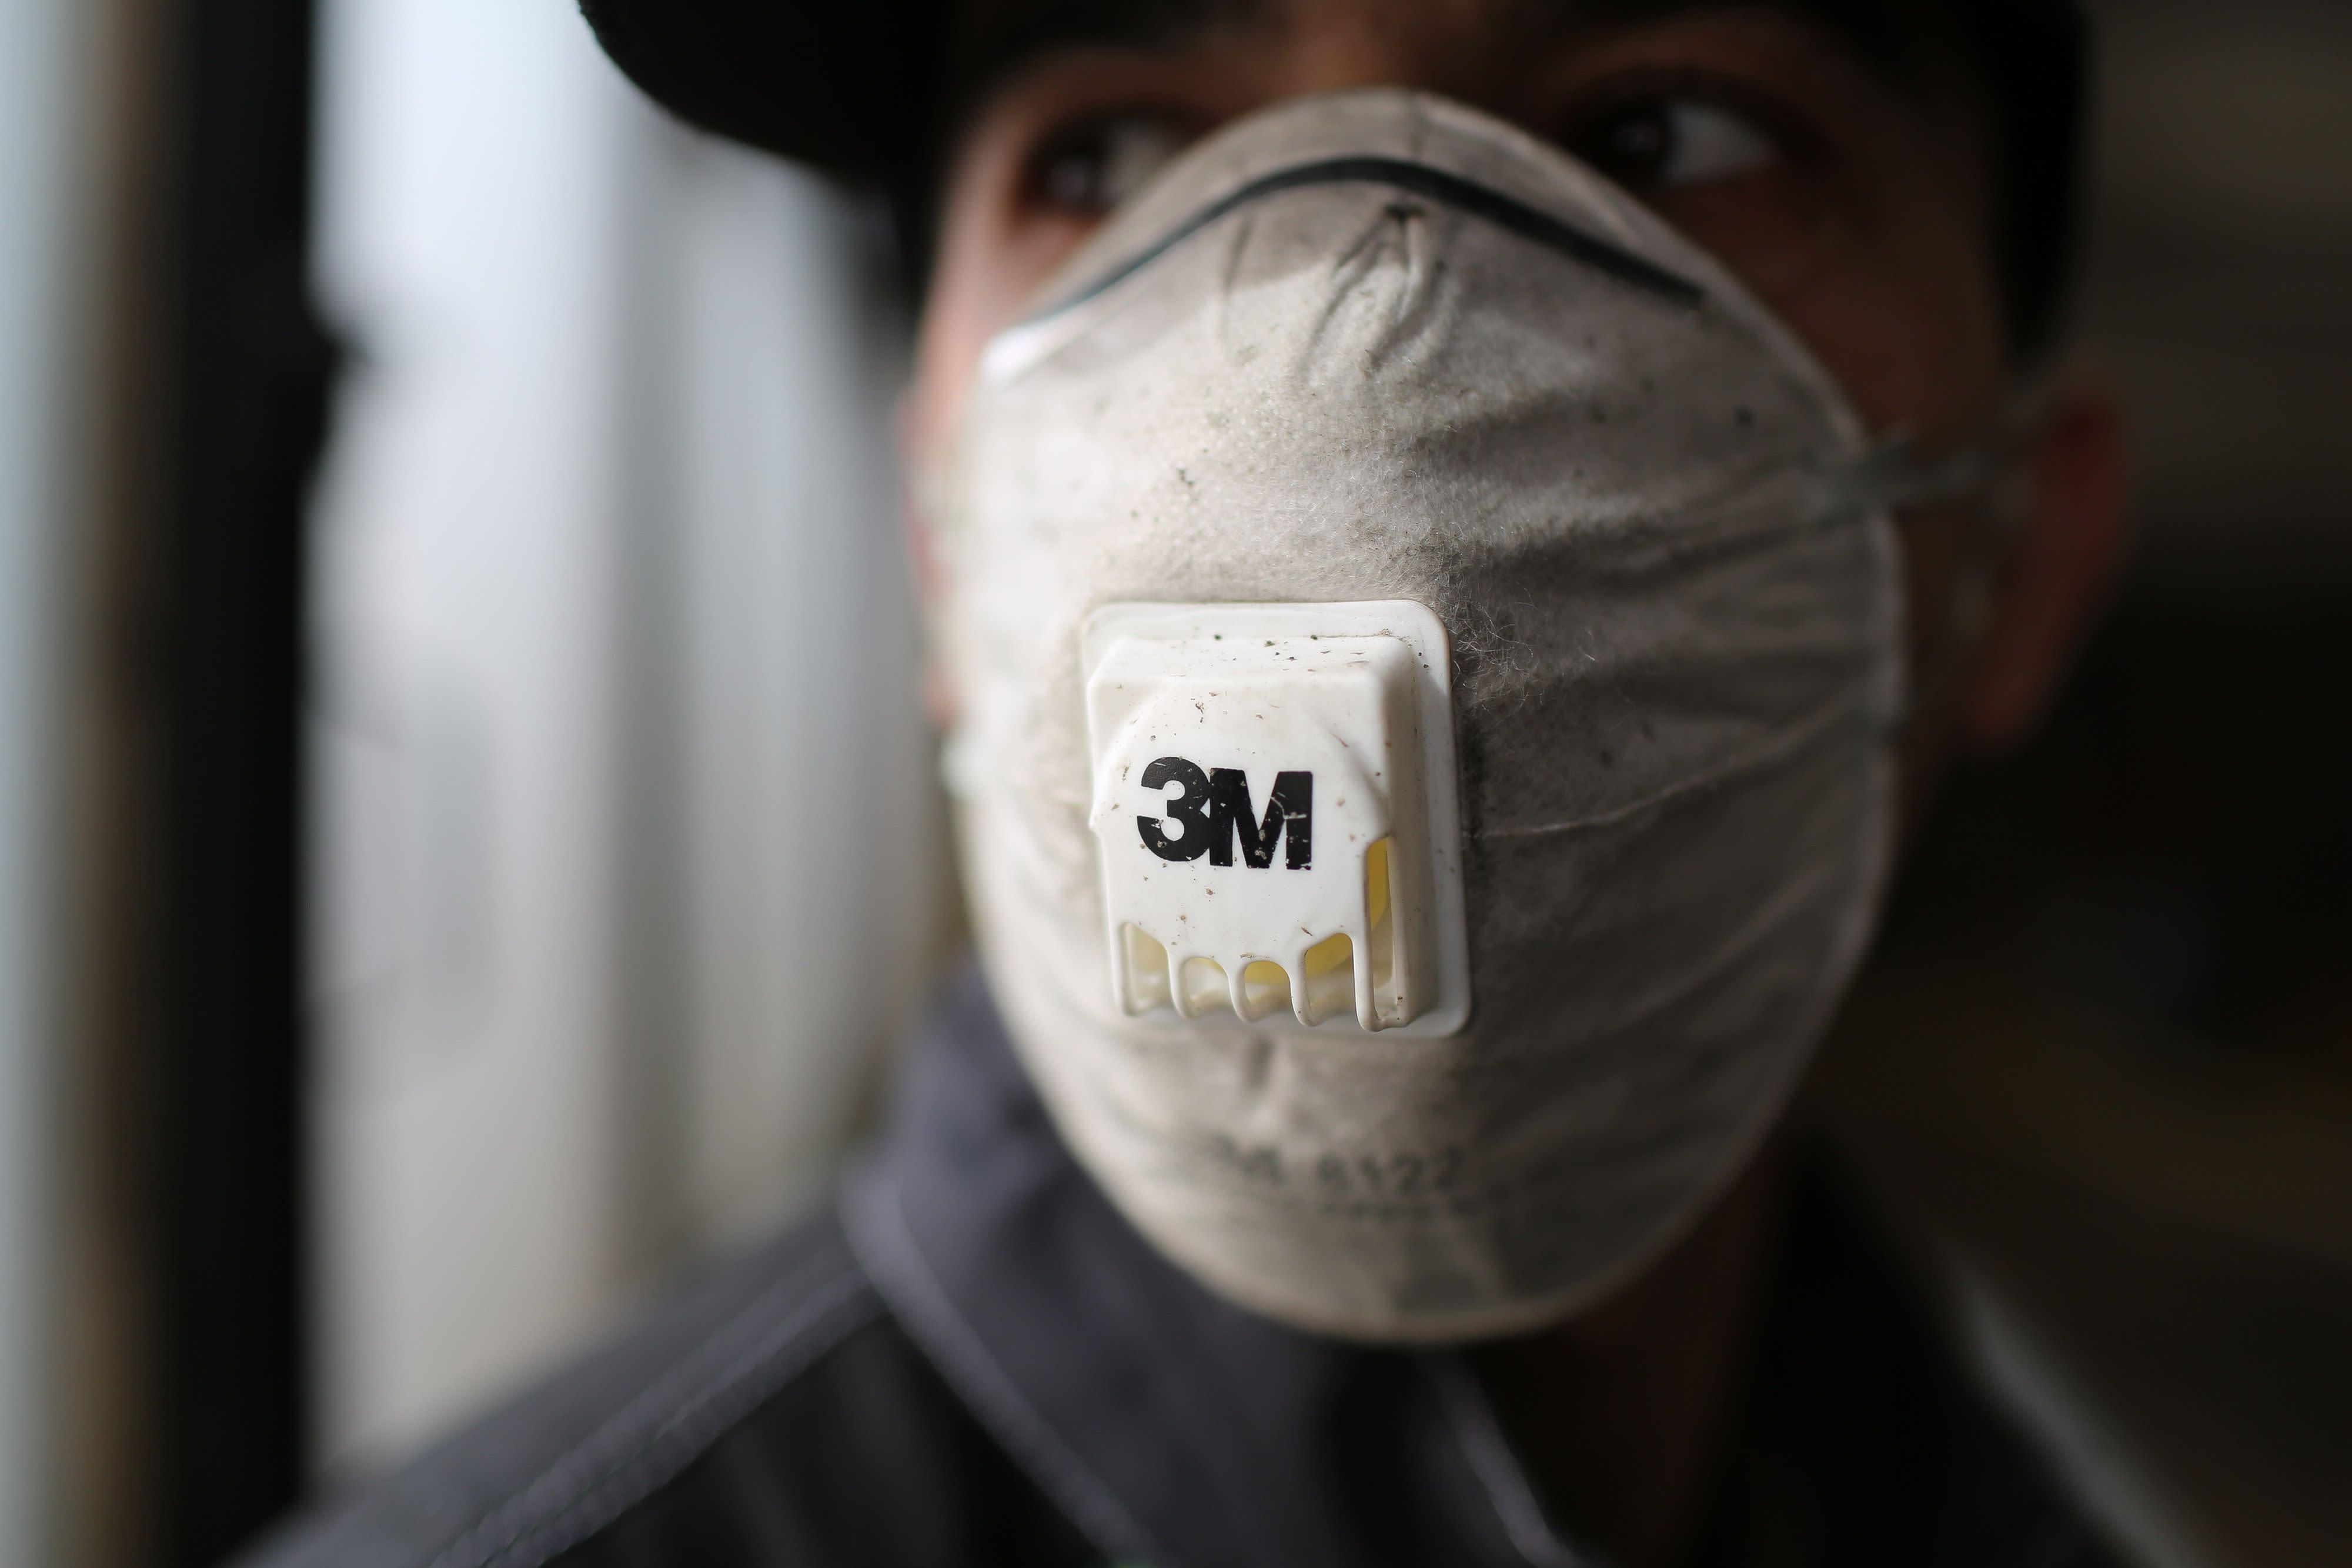 3m standard face mask